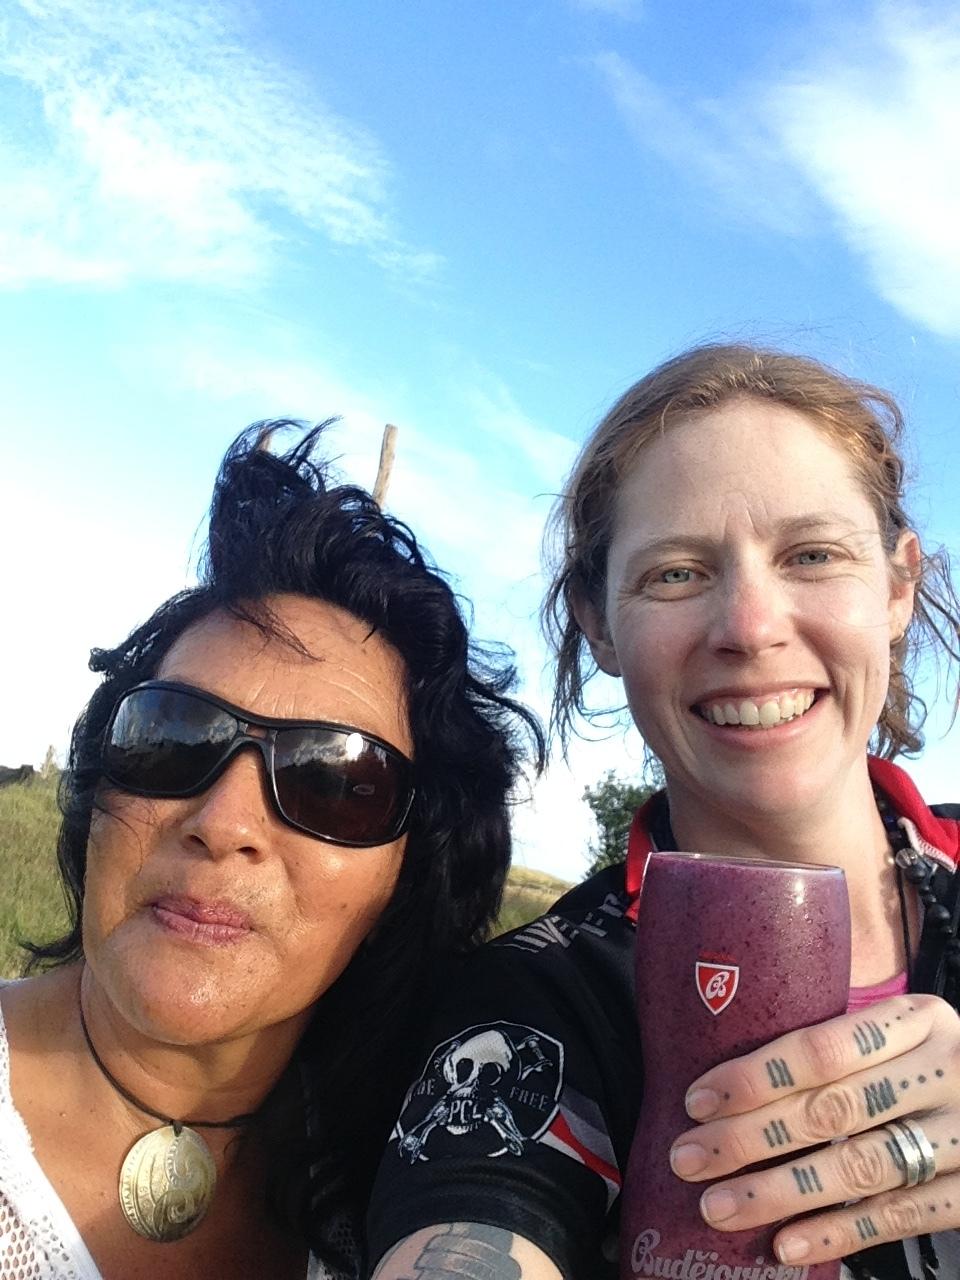 Tania and casey new zealand utea campground .JPG